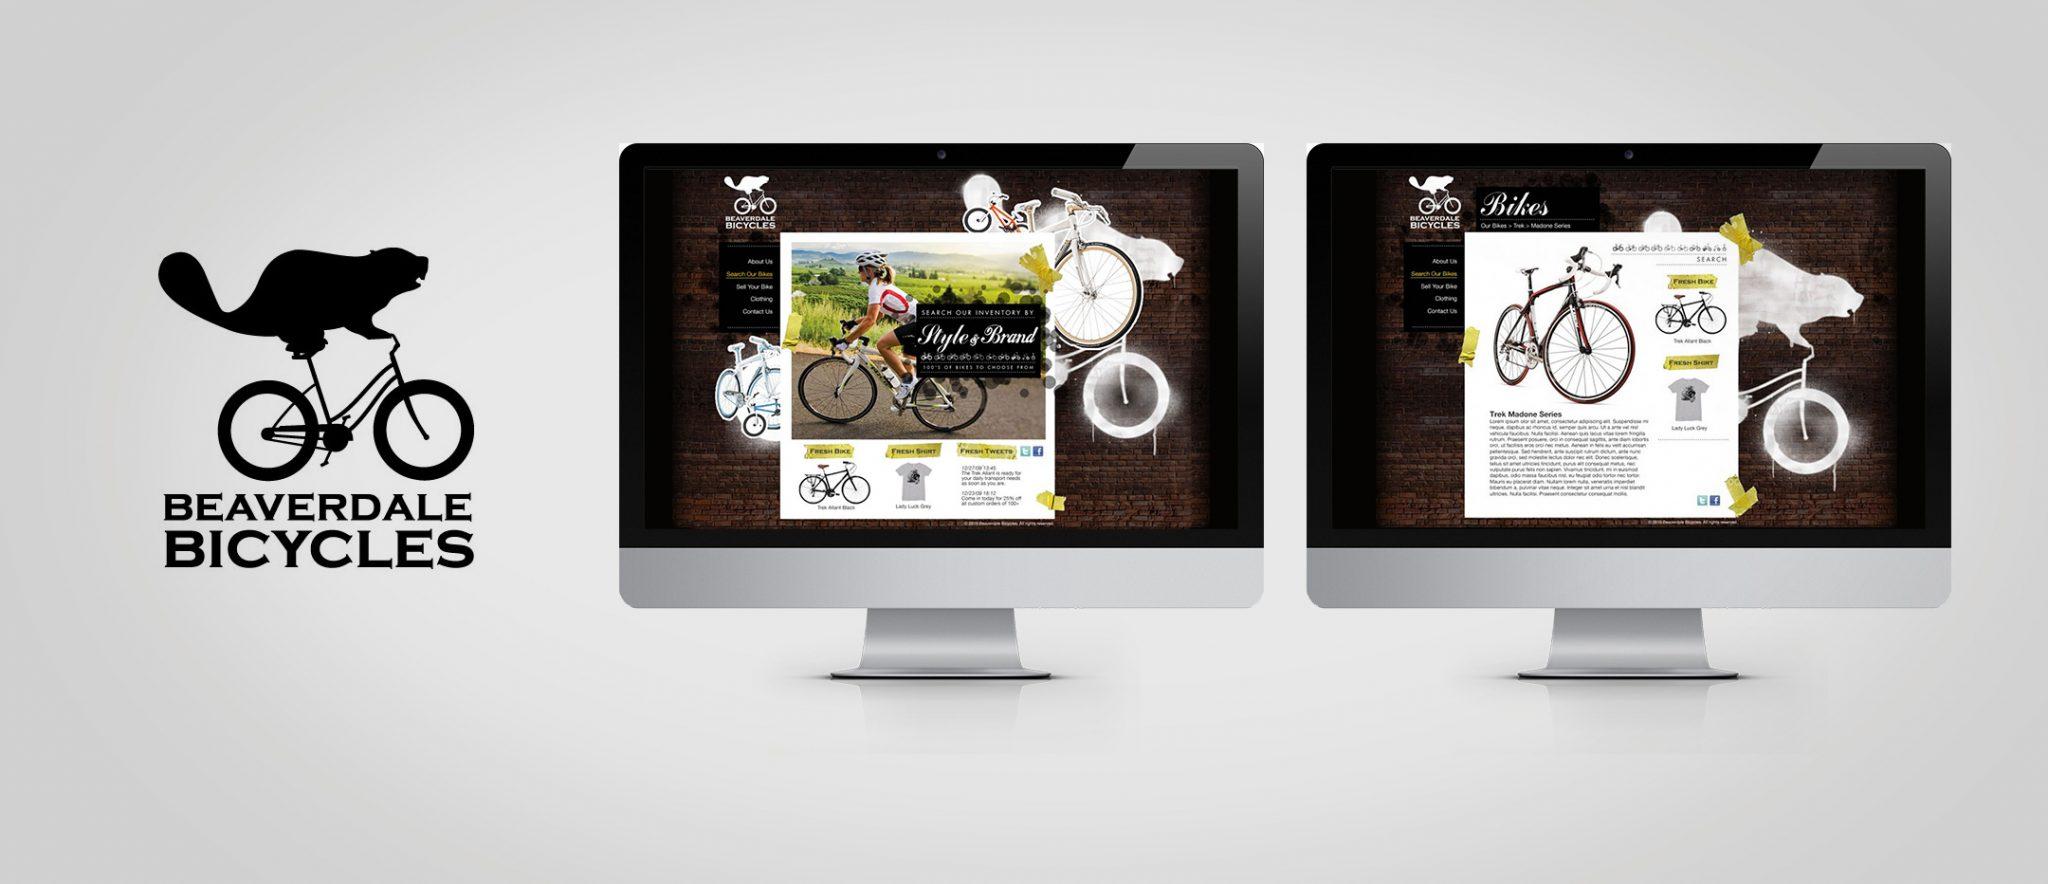 Beaverdale Bicycles Branding